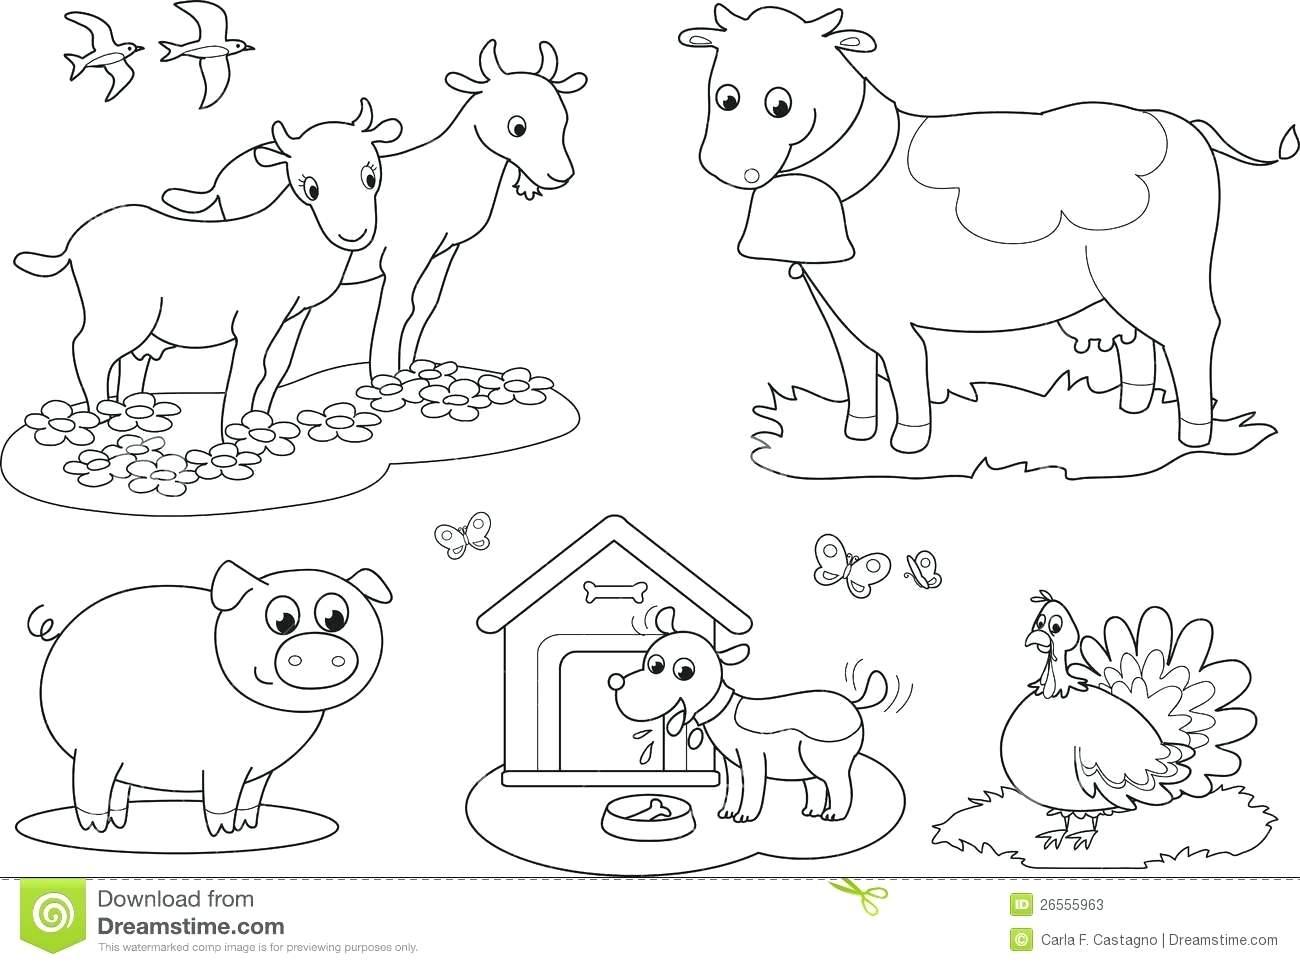 Old Farm Drawing At Getdrawings